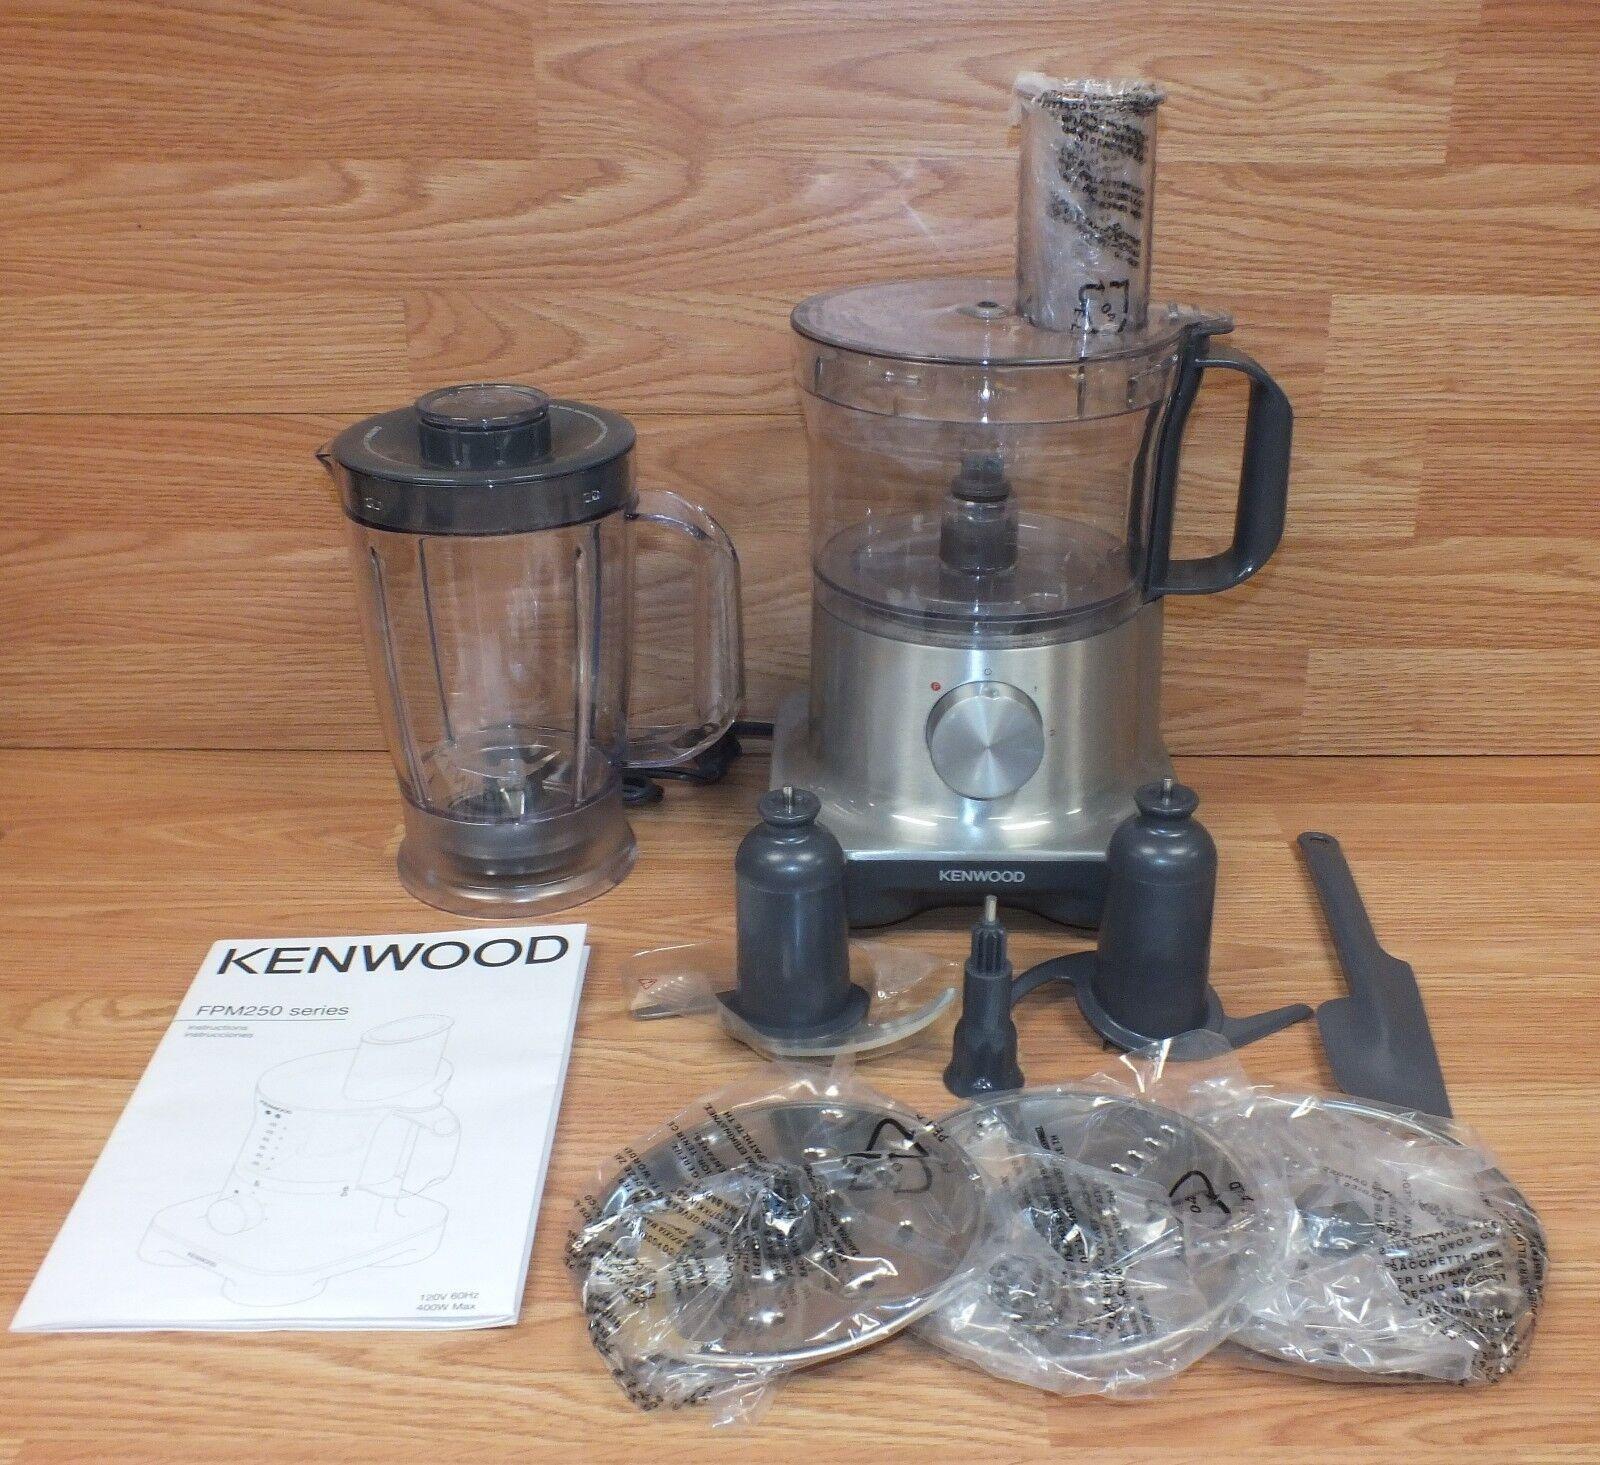 Kenwood (FPM250) MultiPro Compact 400W 5 Cup Food Processor Bundle READ